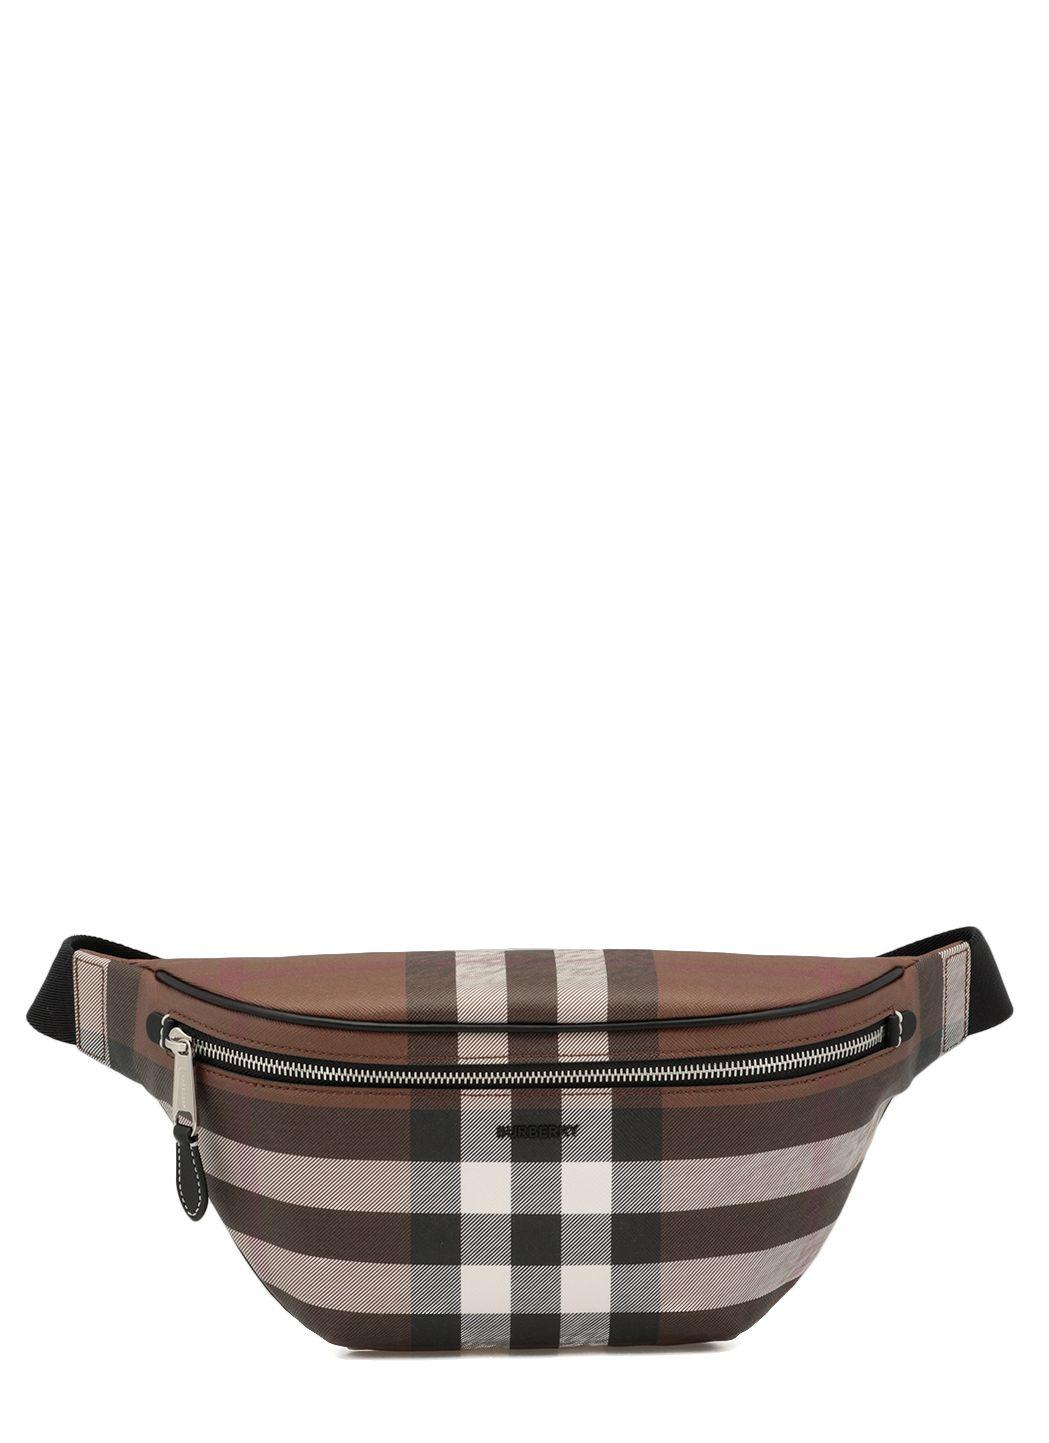 Cotton blend belt bag with tartan pattern